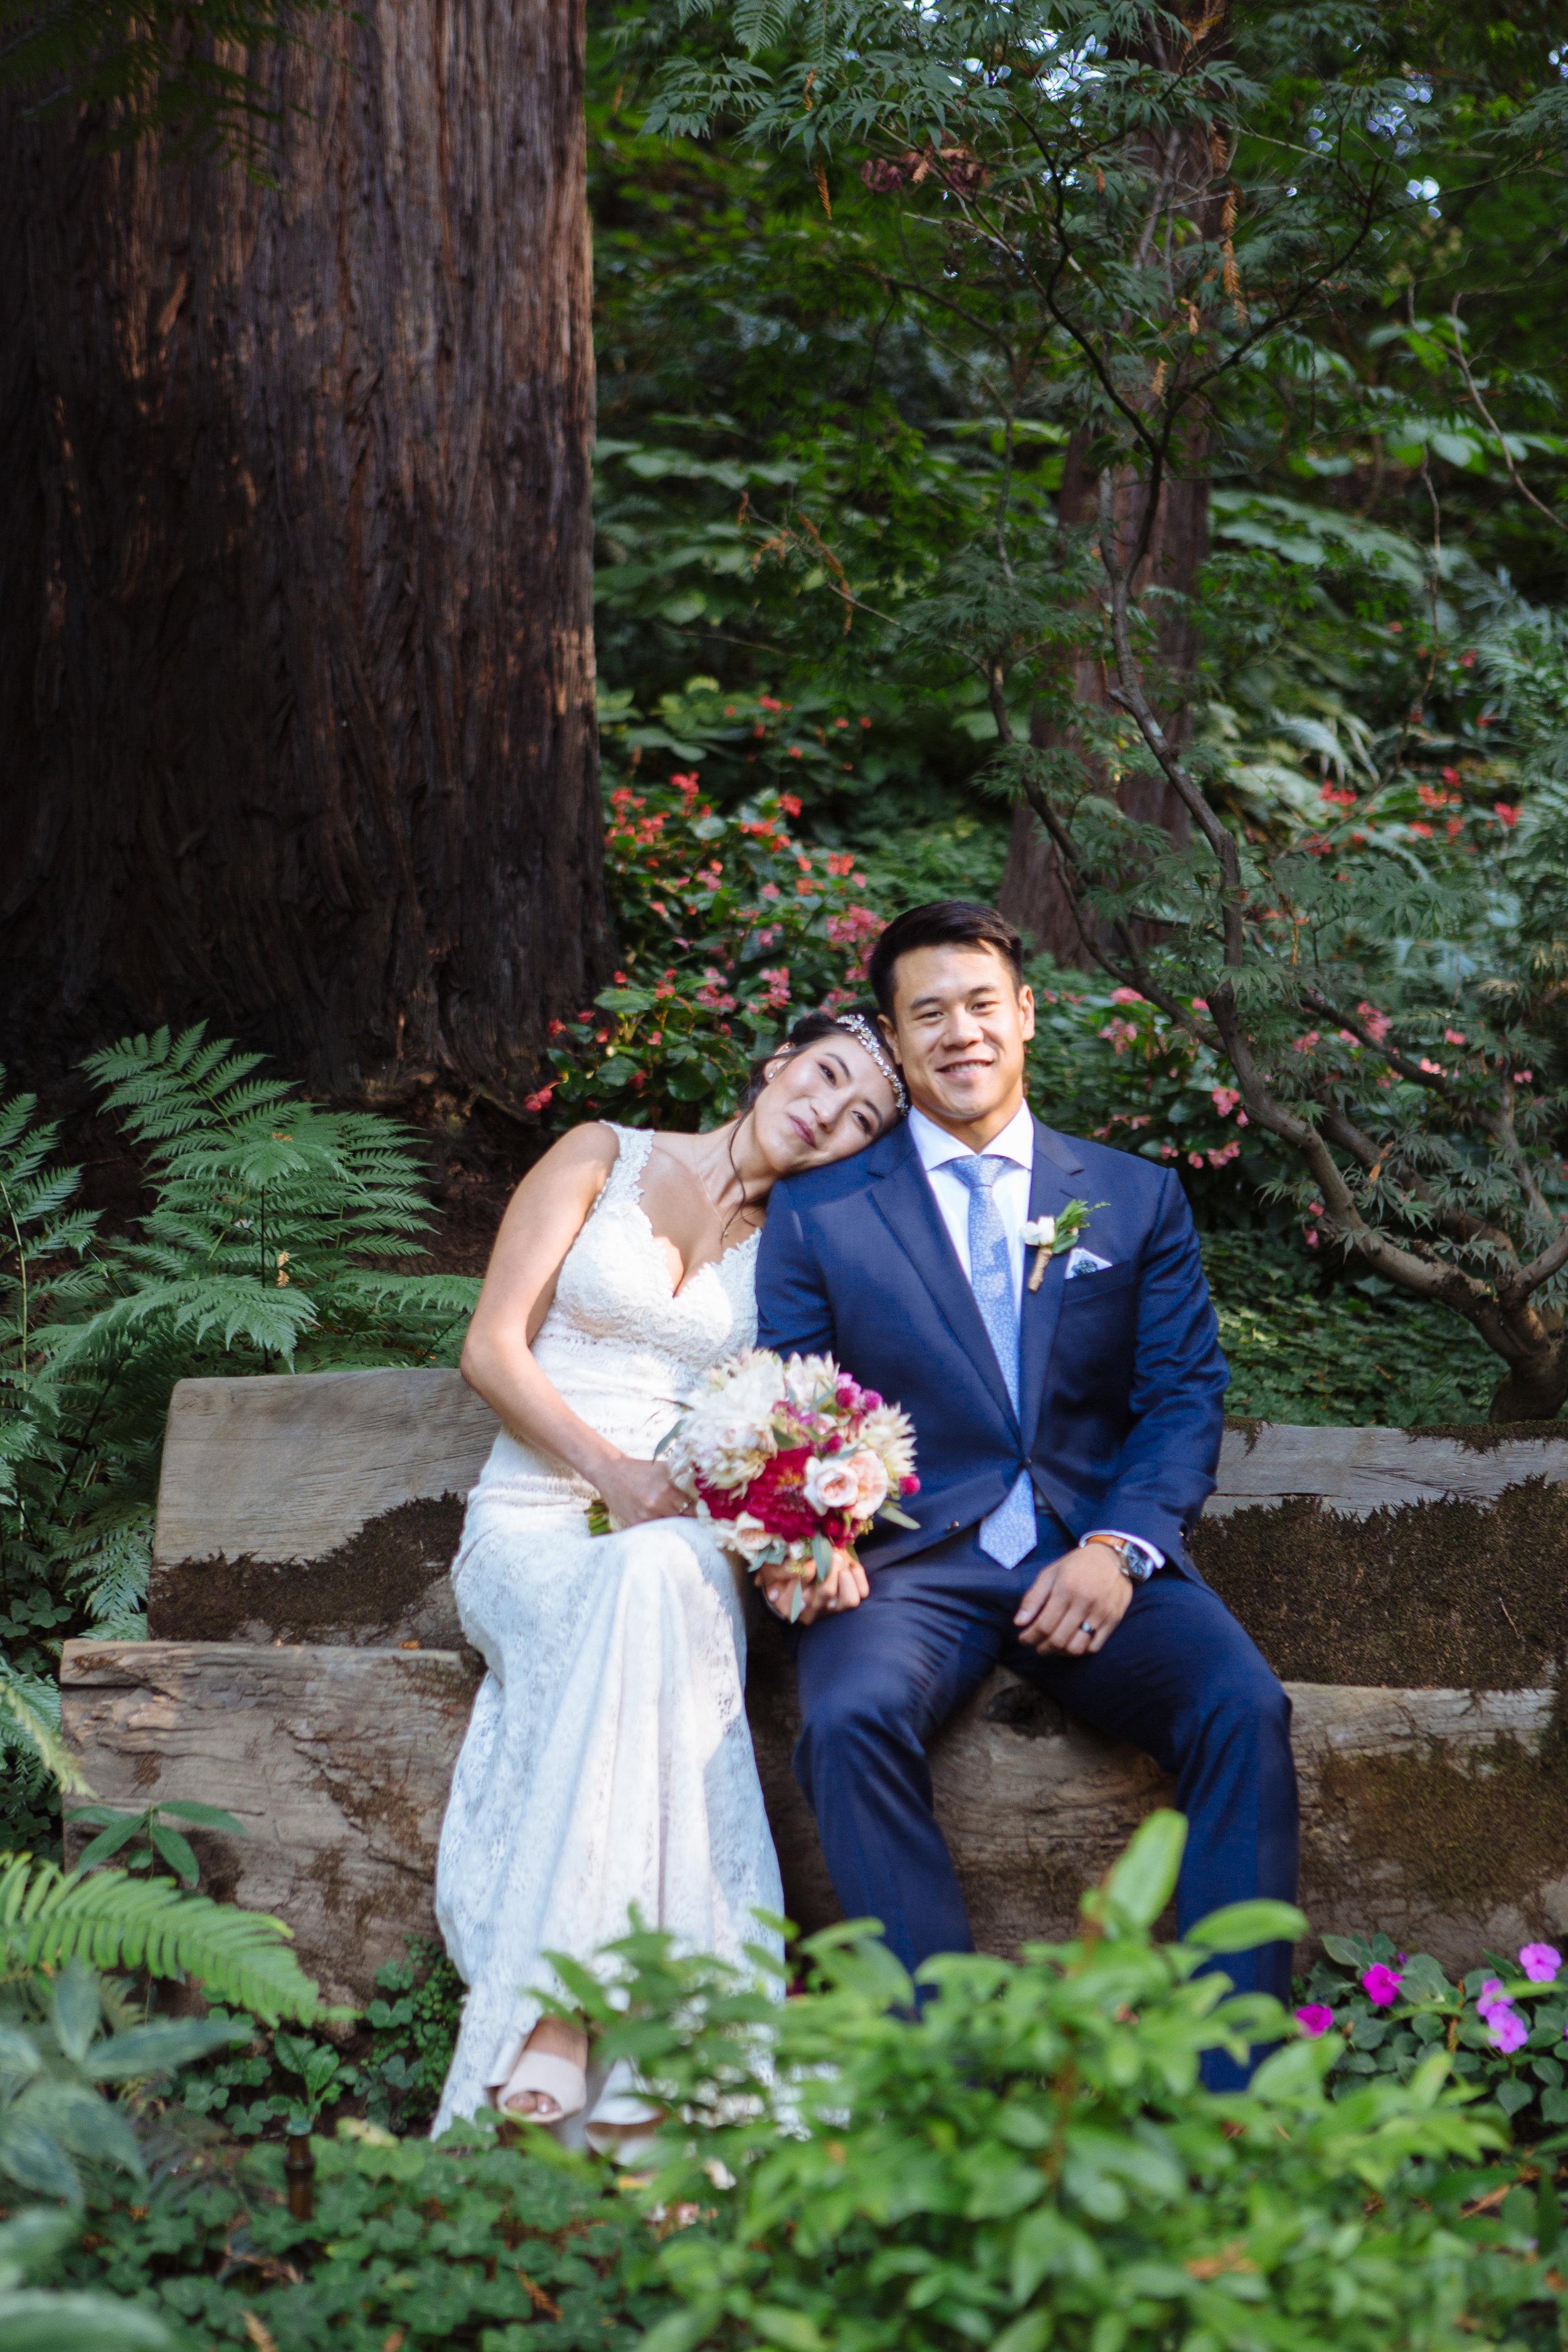 Nestldown Wedding Photography